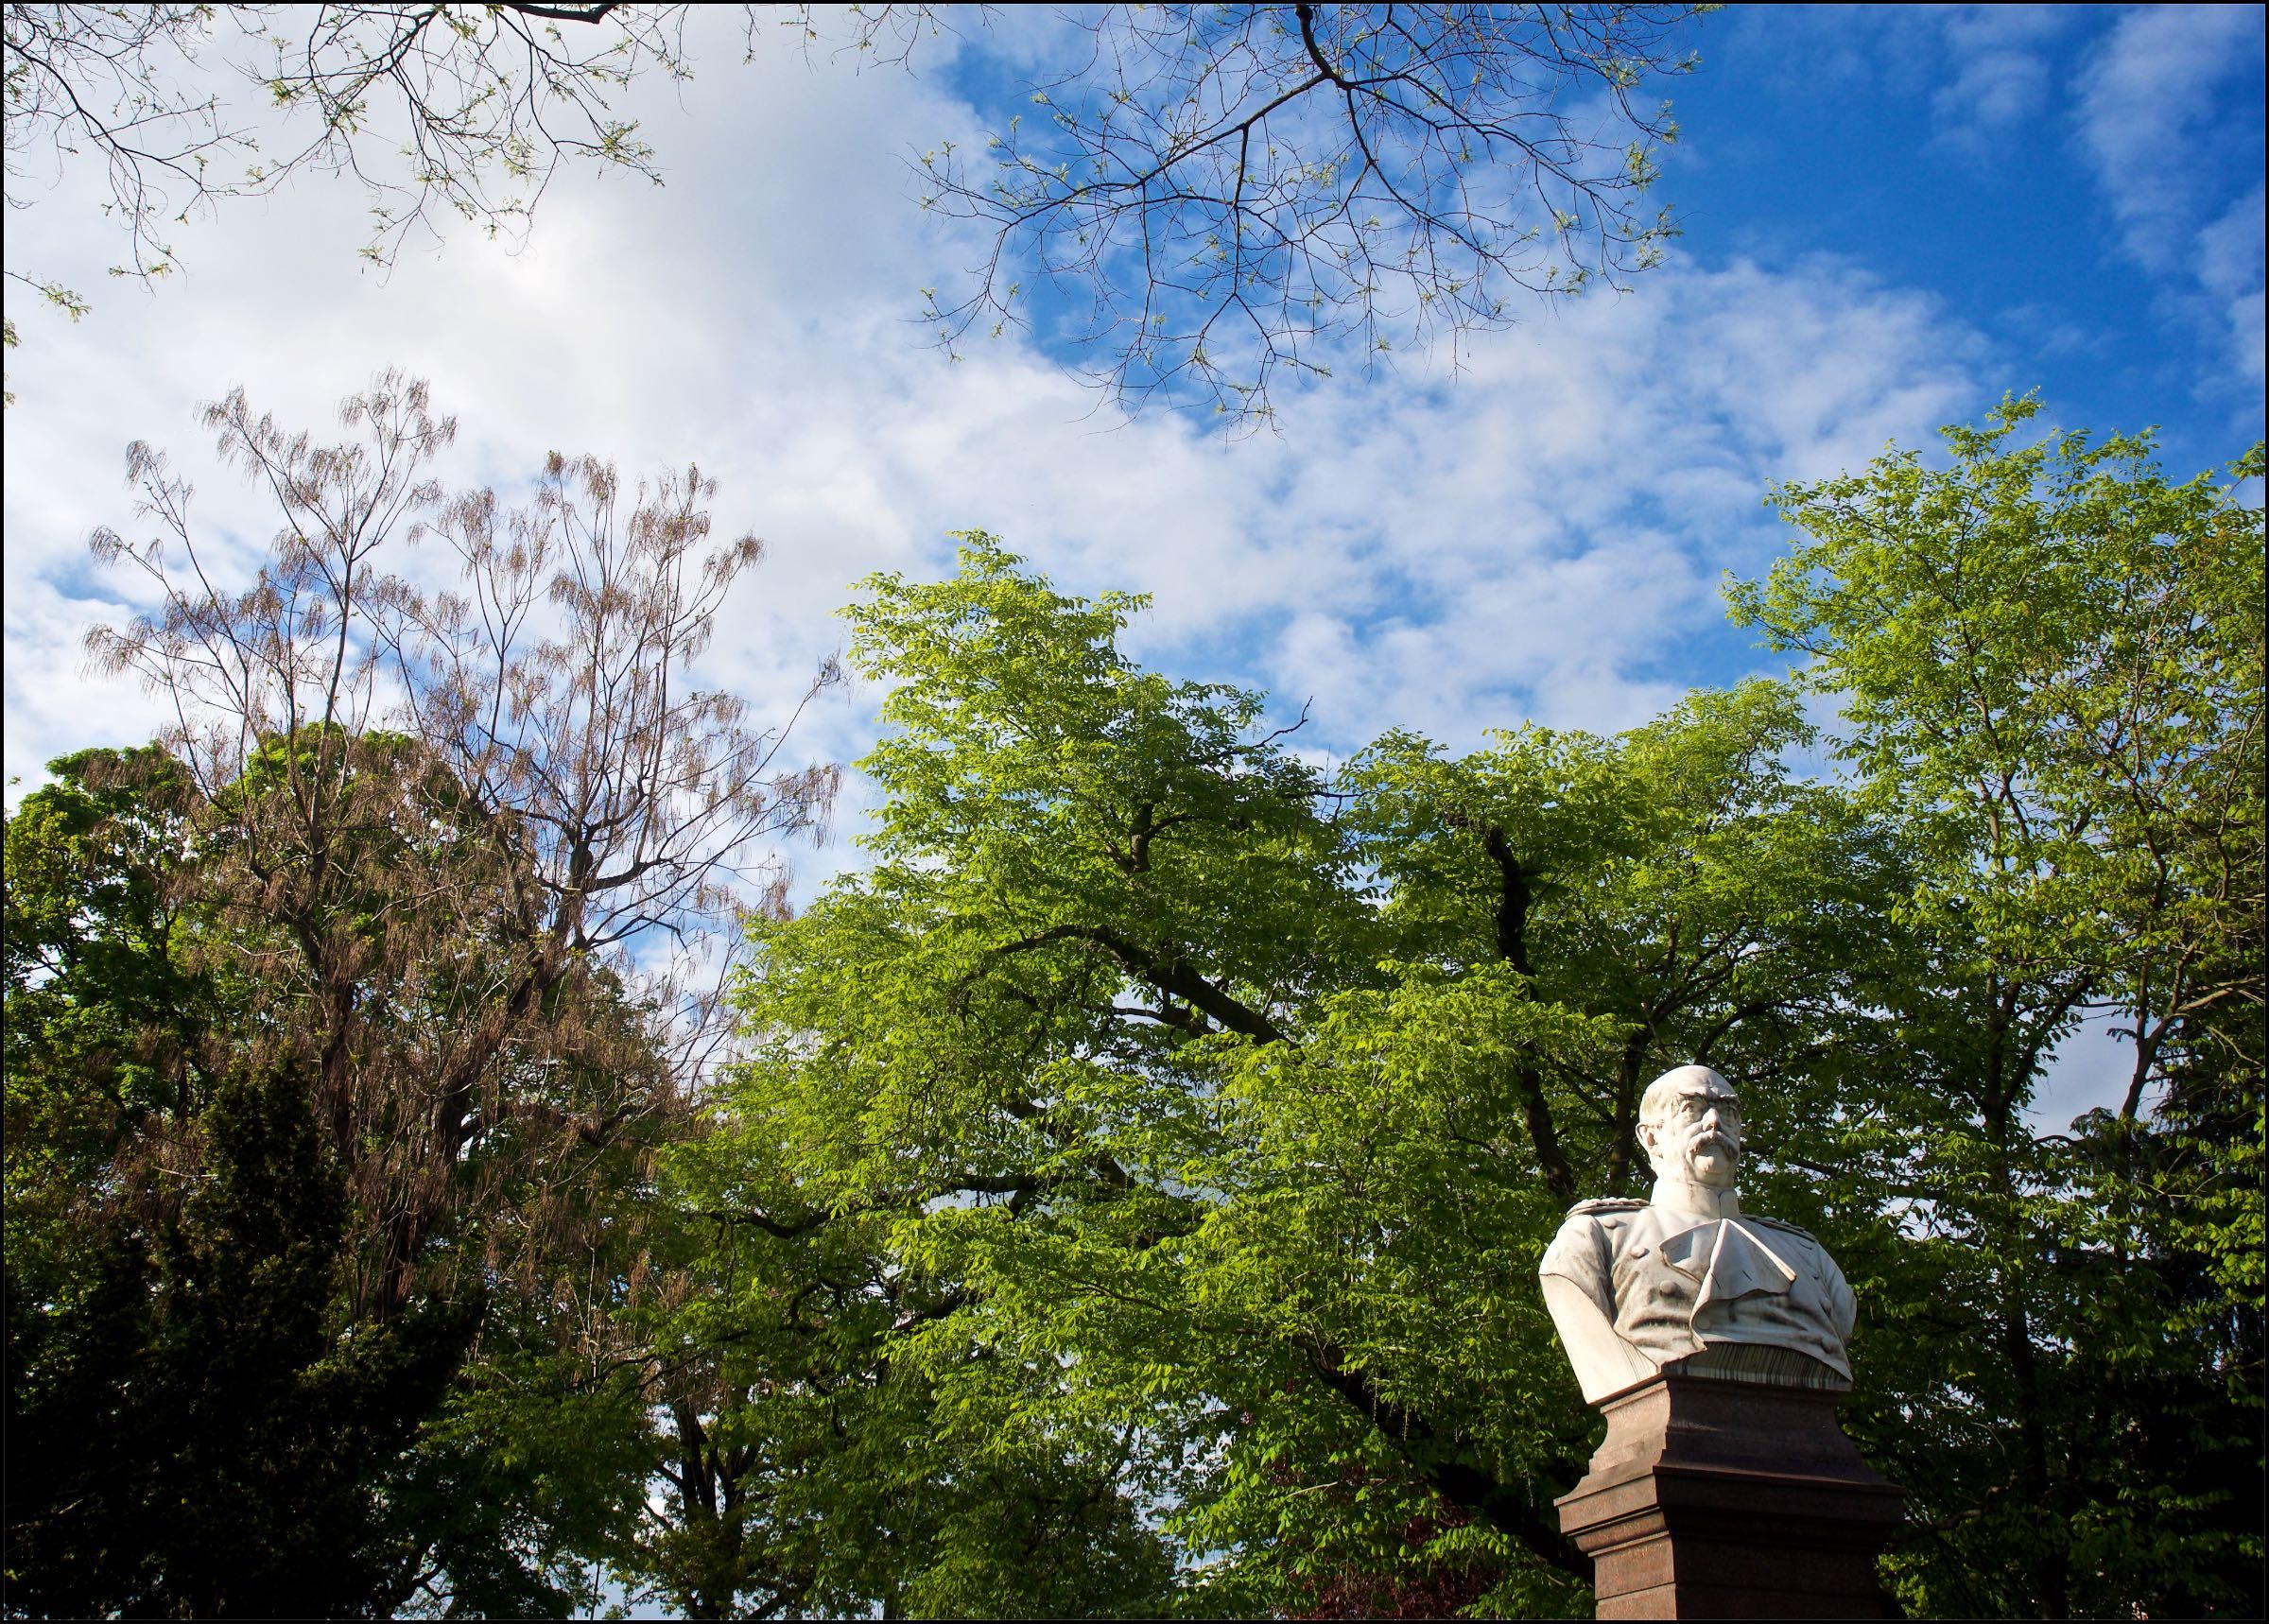 Bismarck Statue